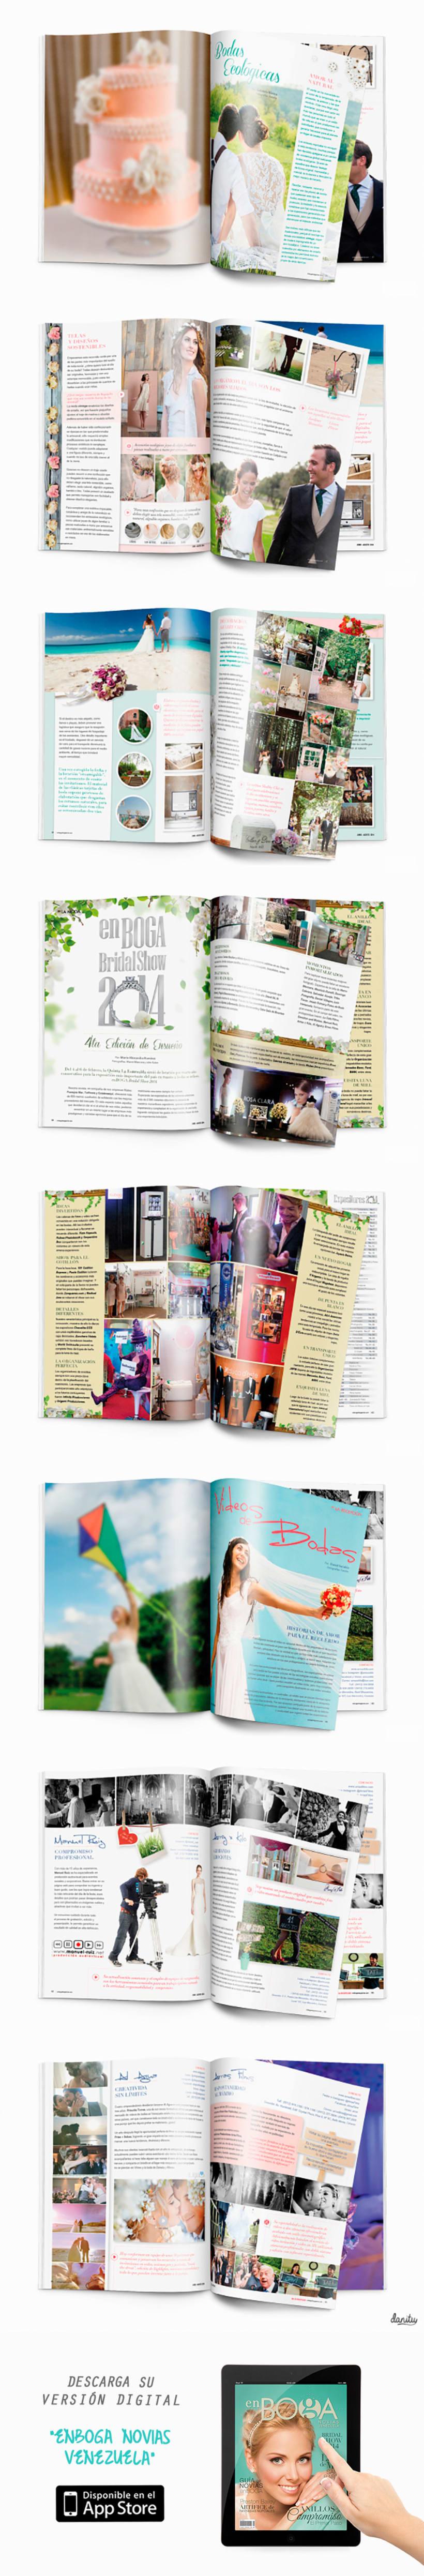 Revista enBOGA Novias 7